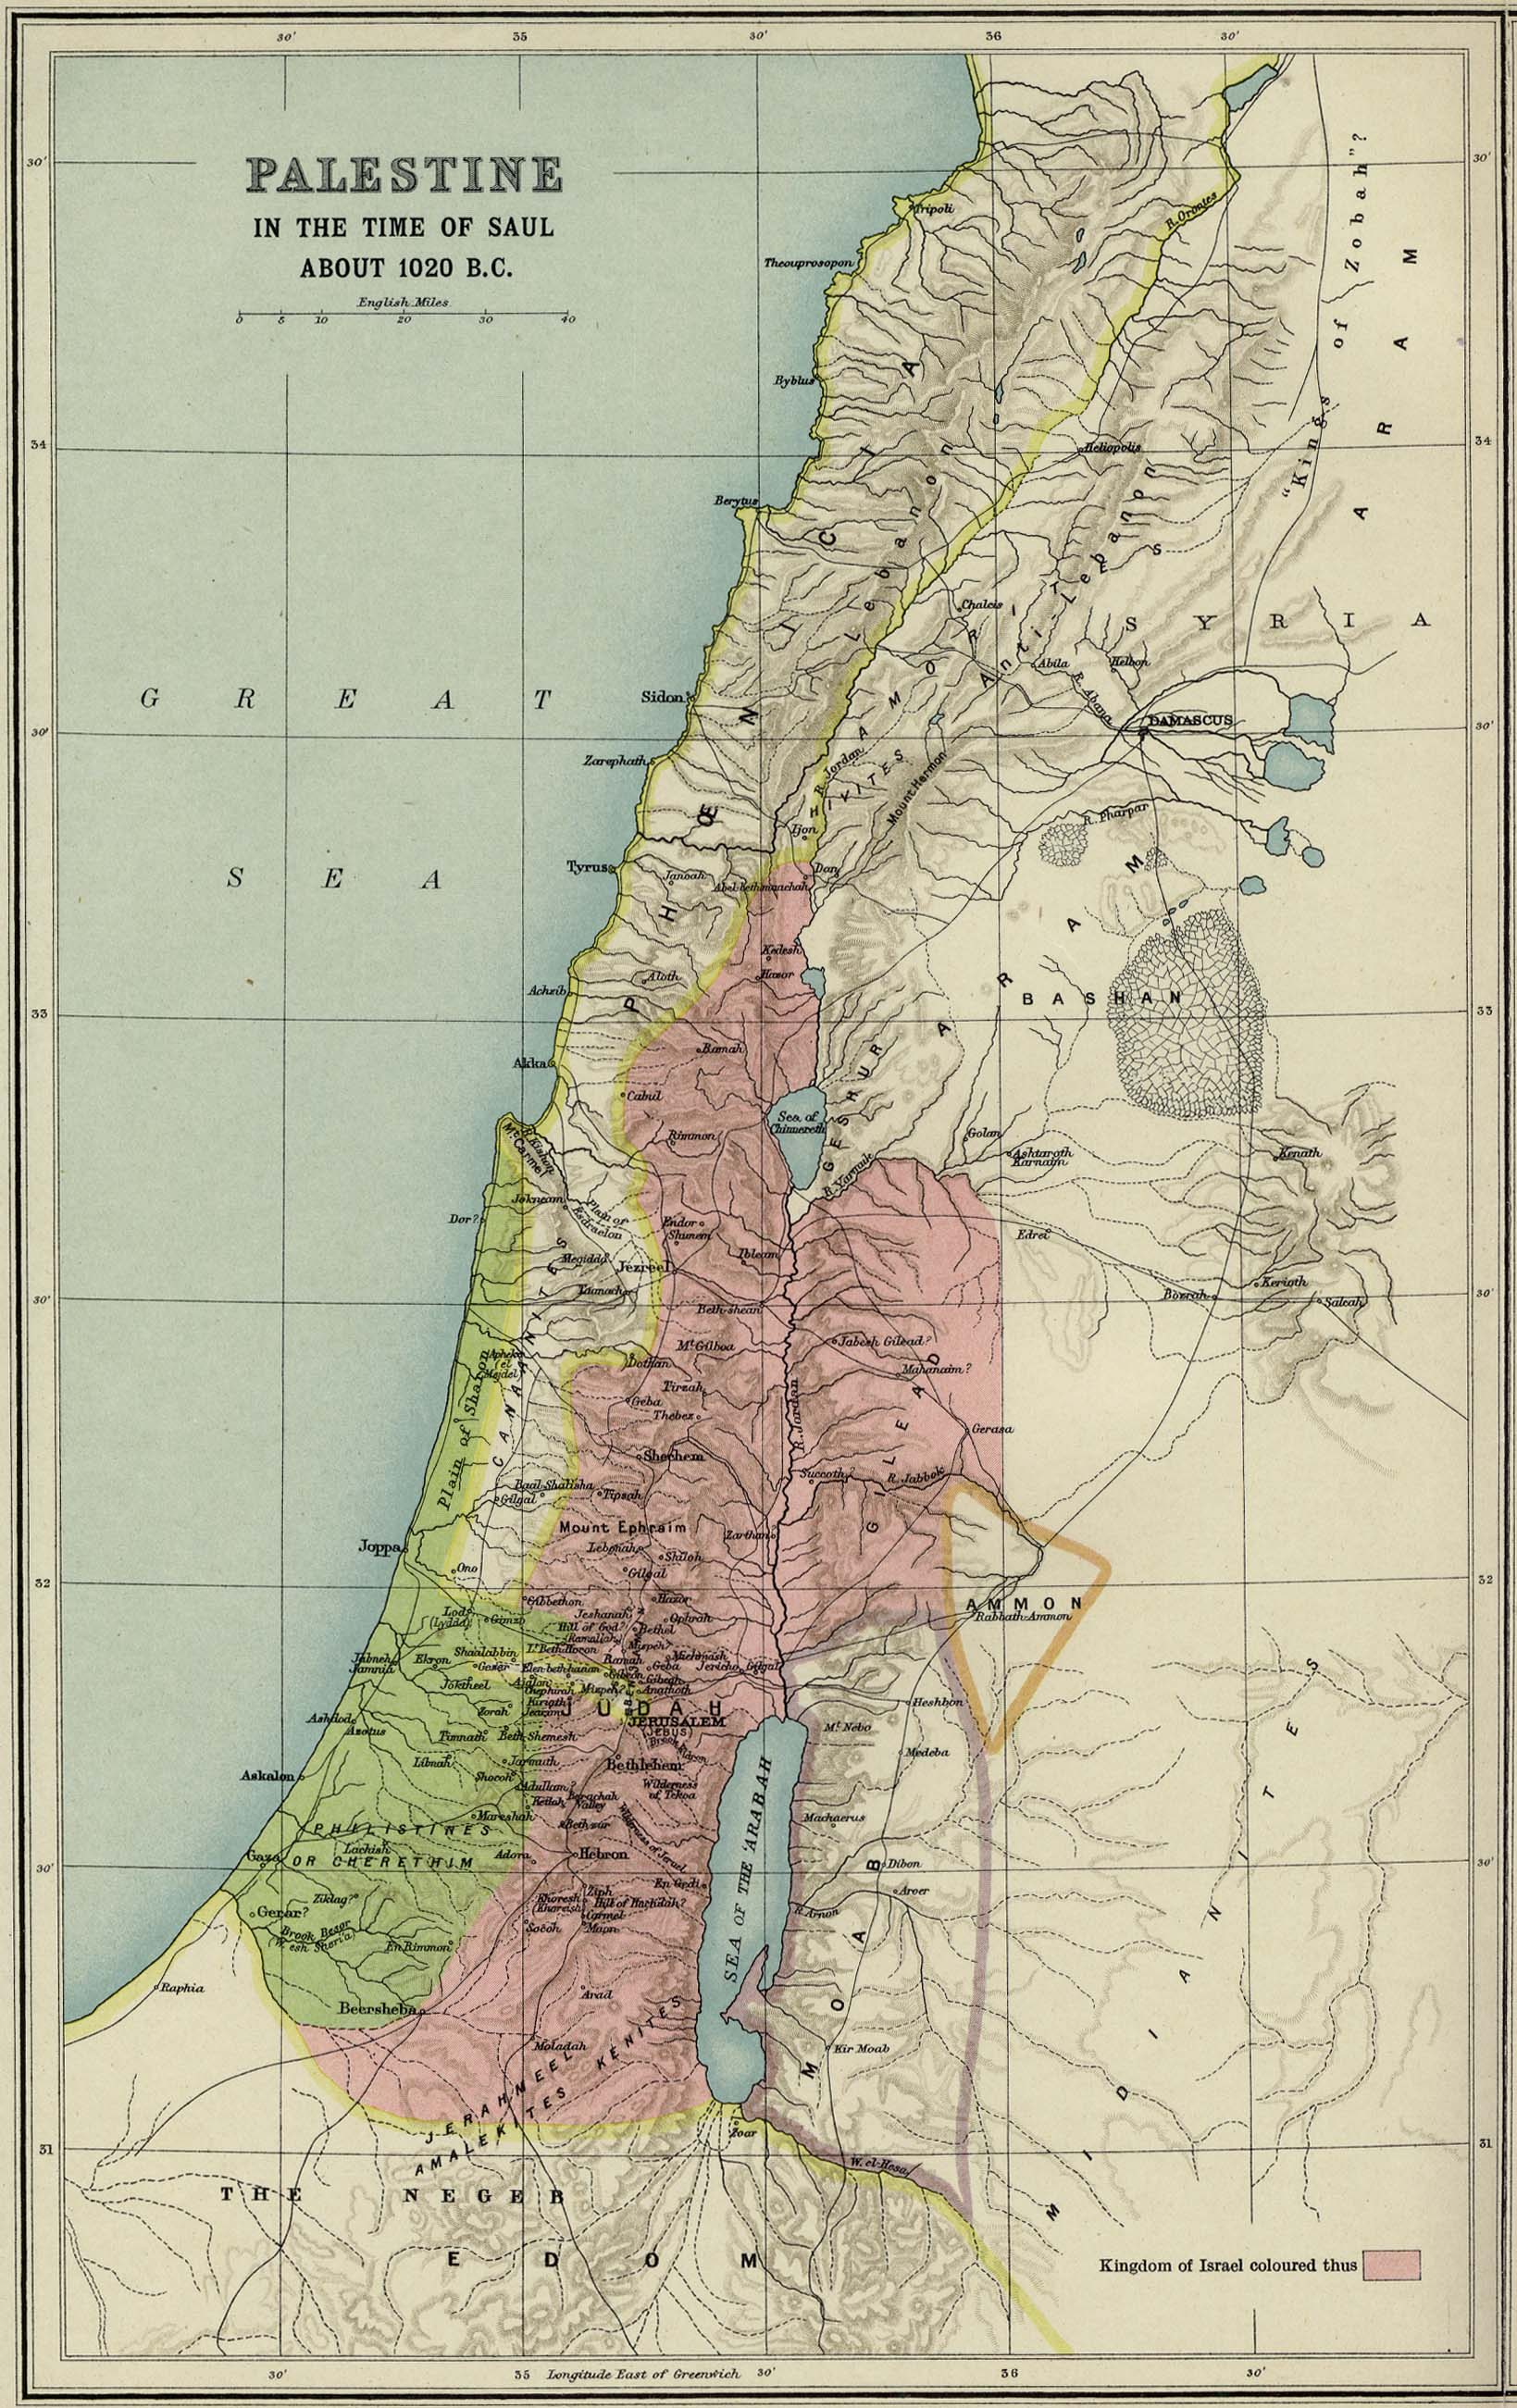 Palestine Map 1020 B.C.